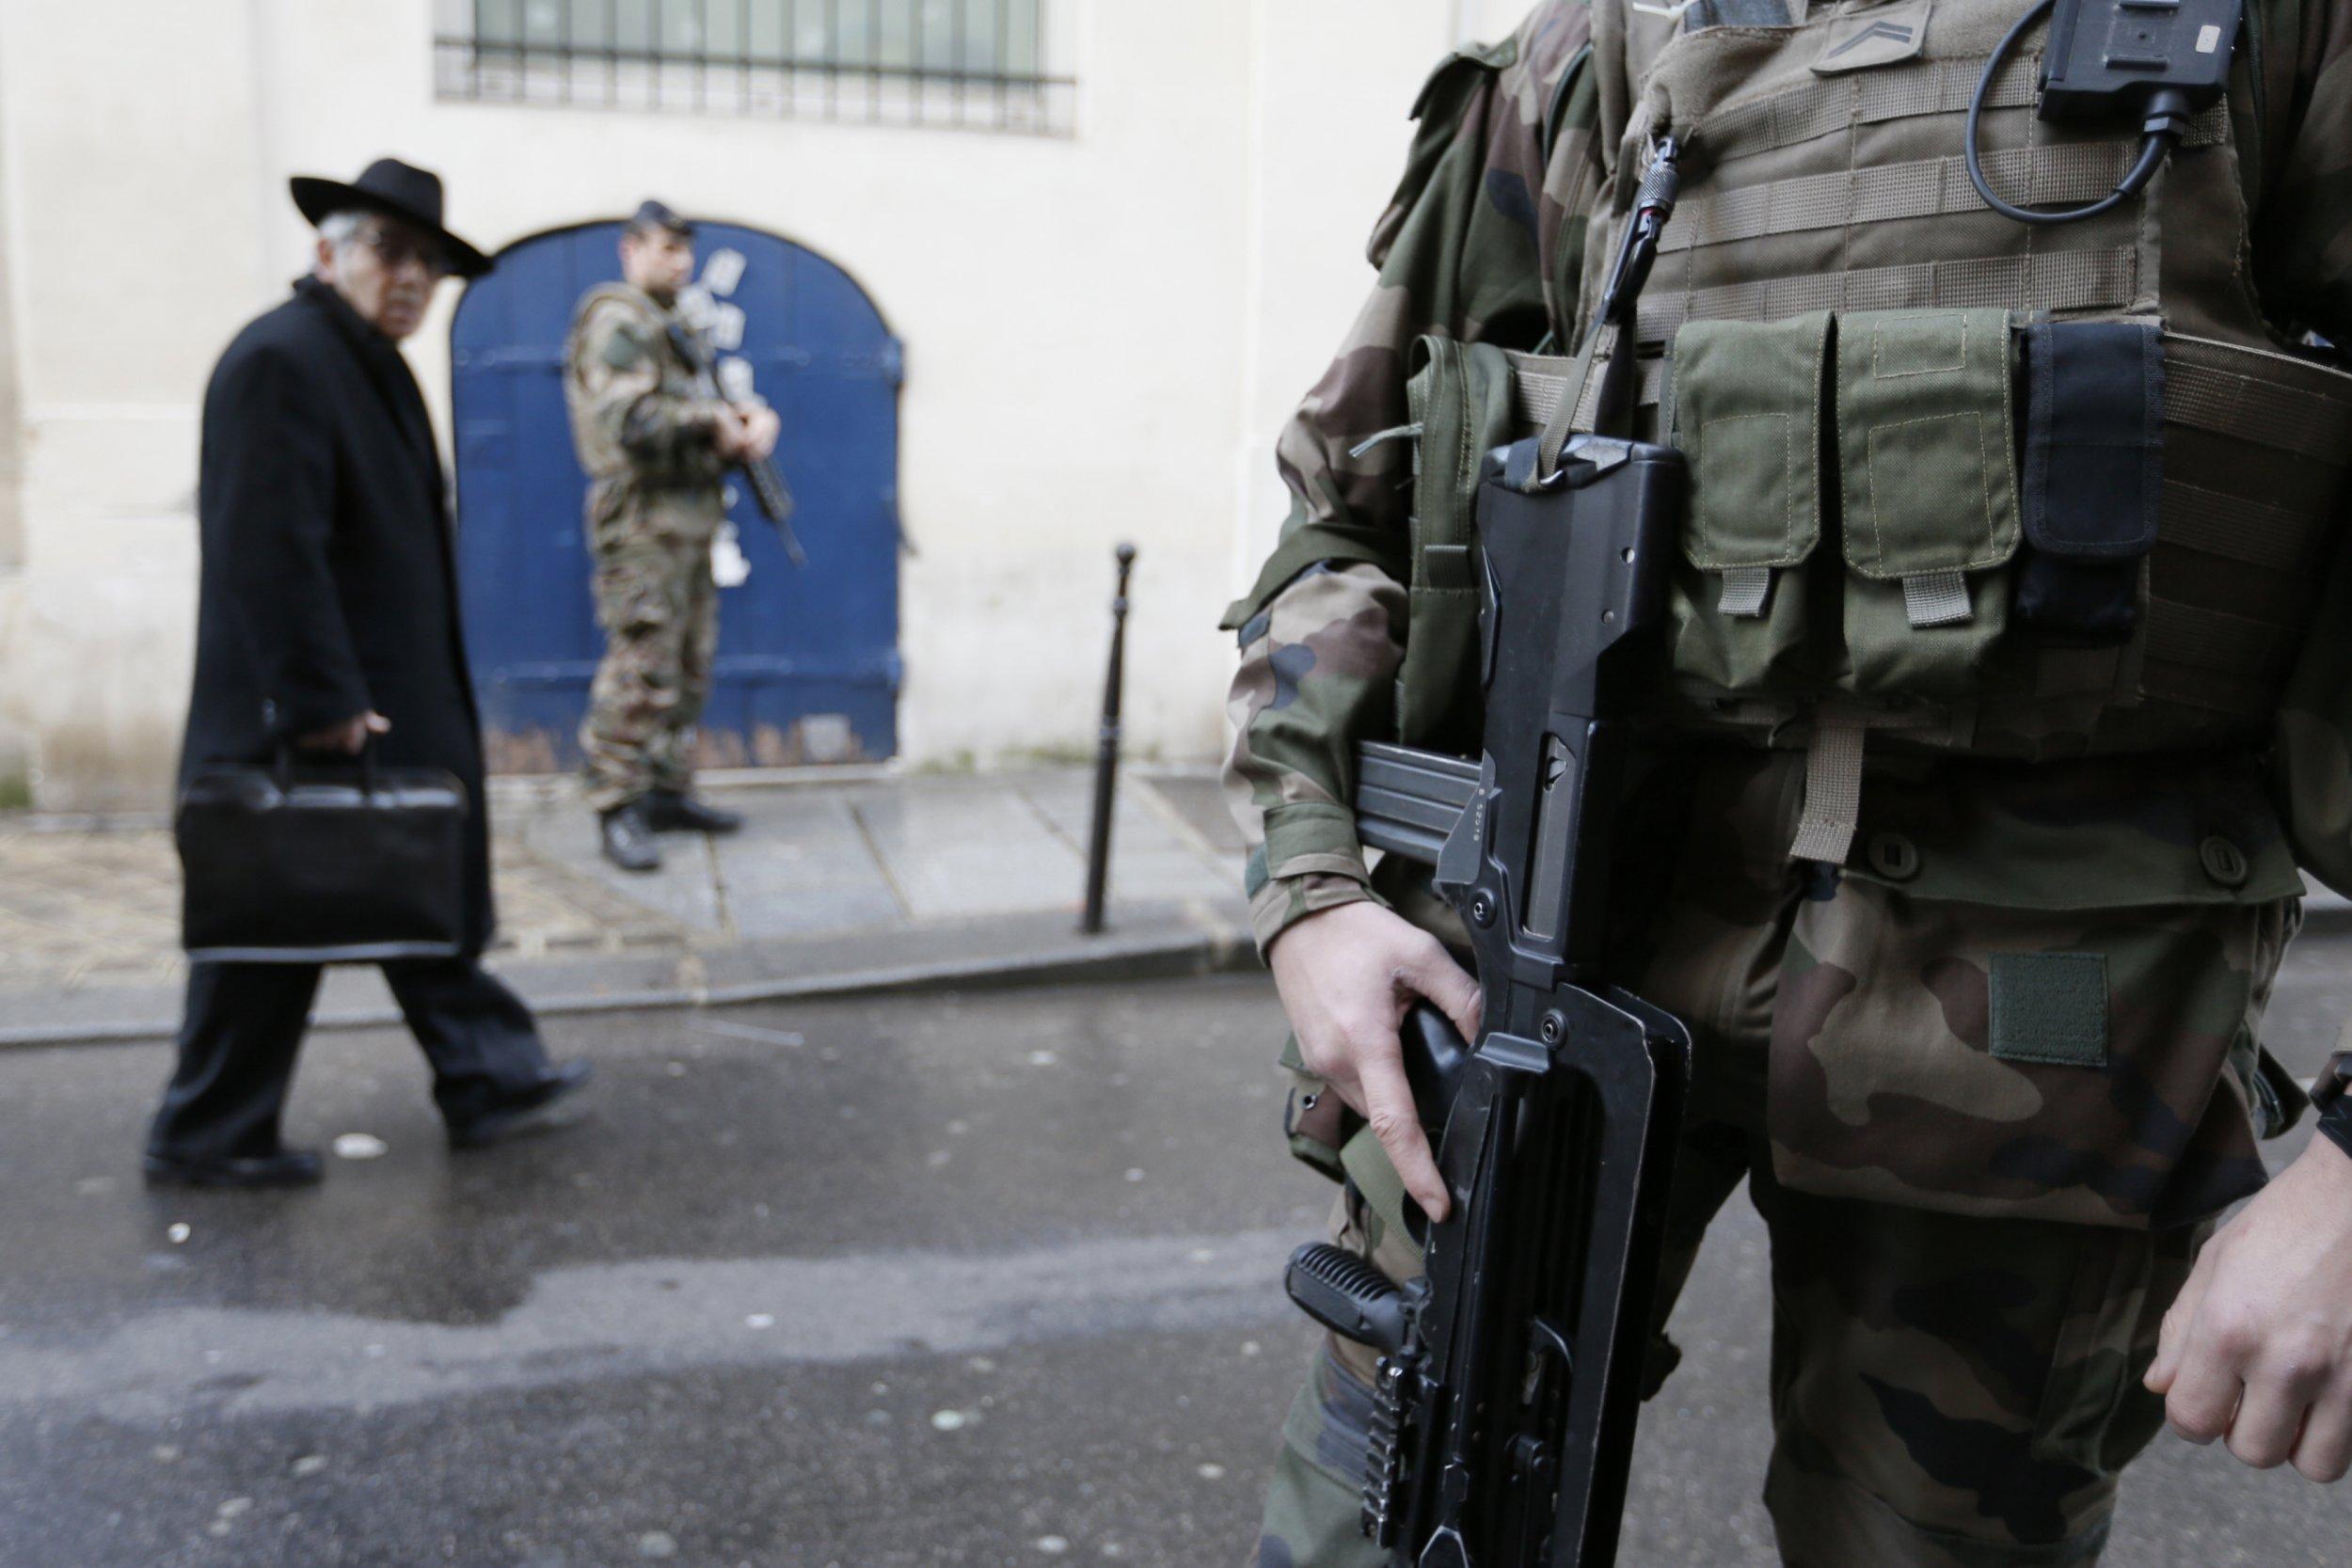 Jewish Paris ISIS